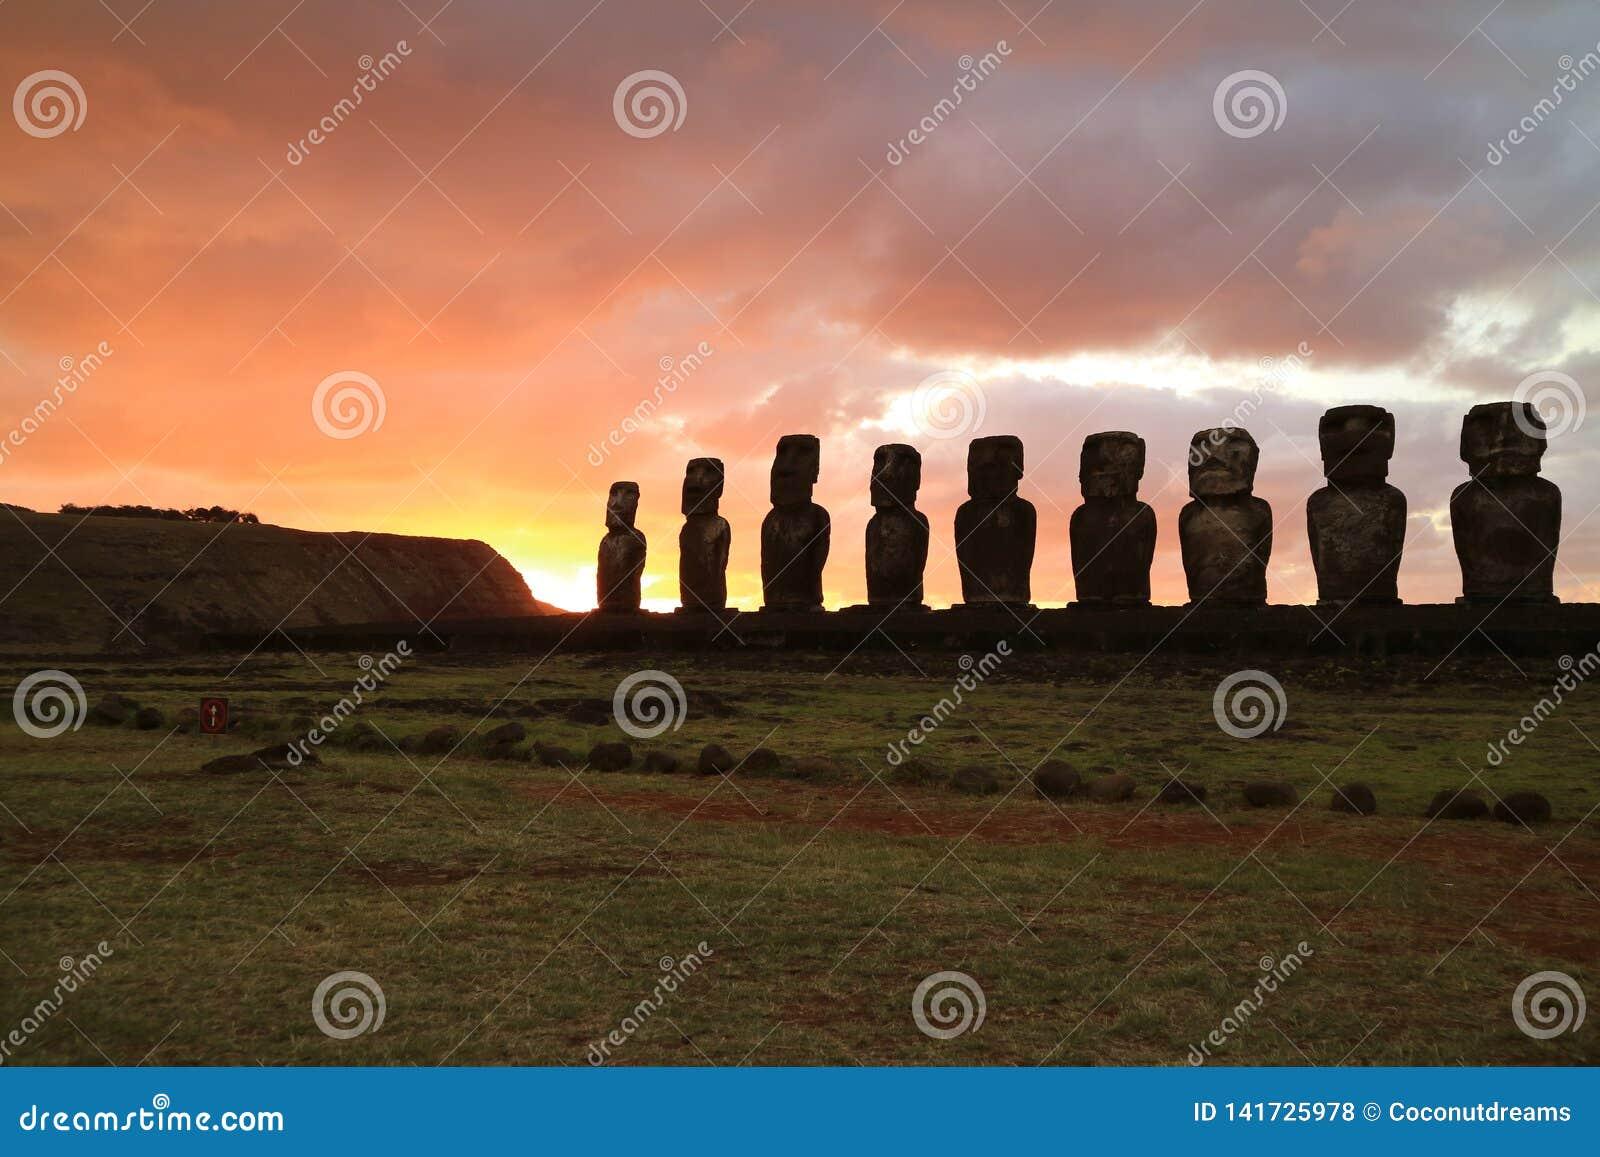 Moai Statues In Ahu Tongariki, Easter Island, Chile Stock